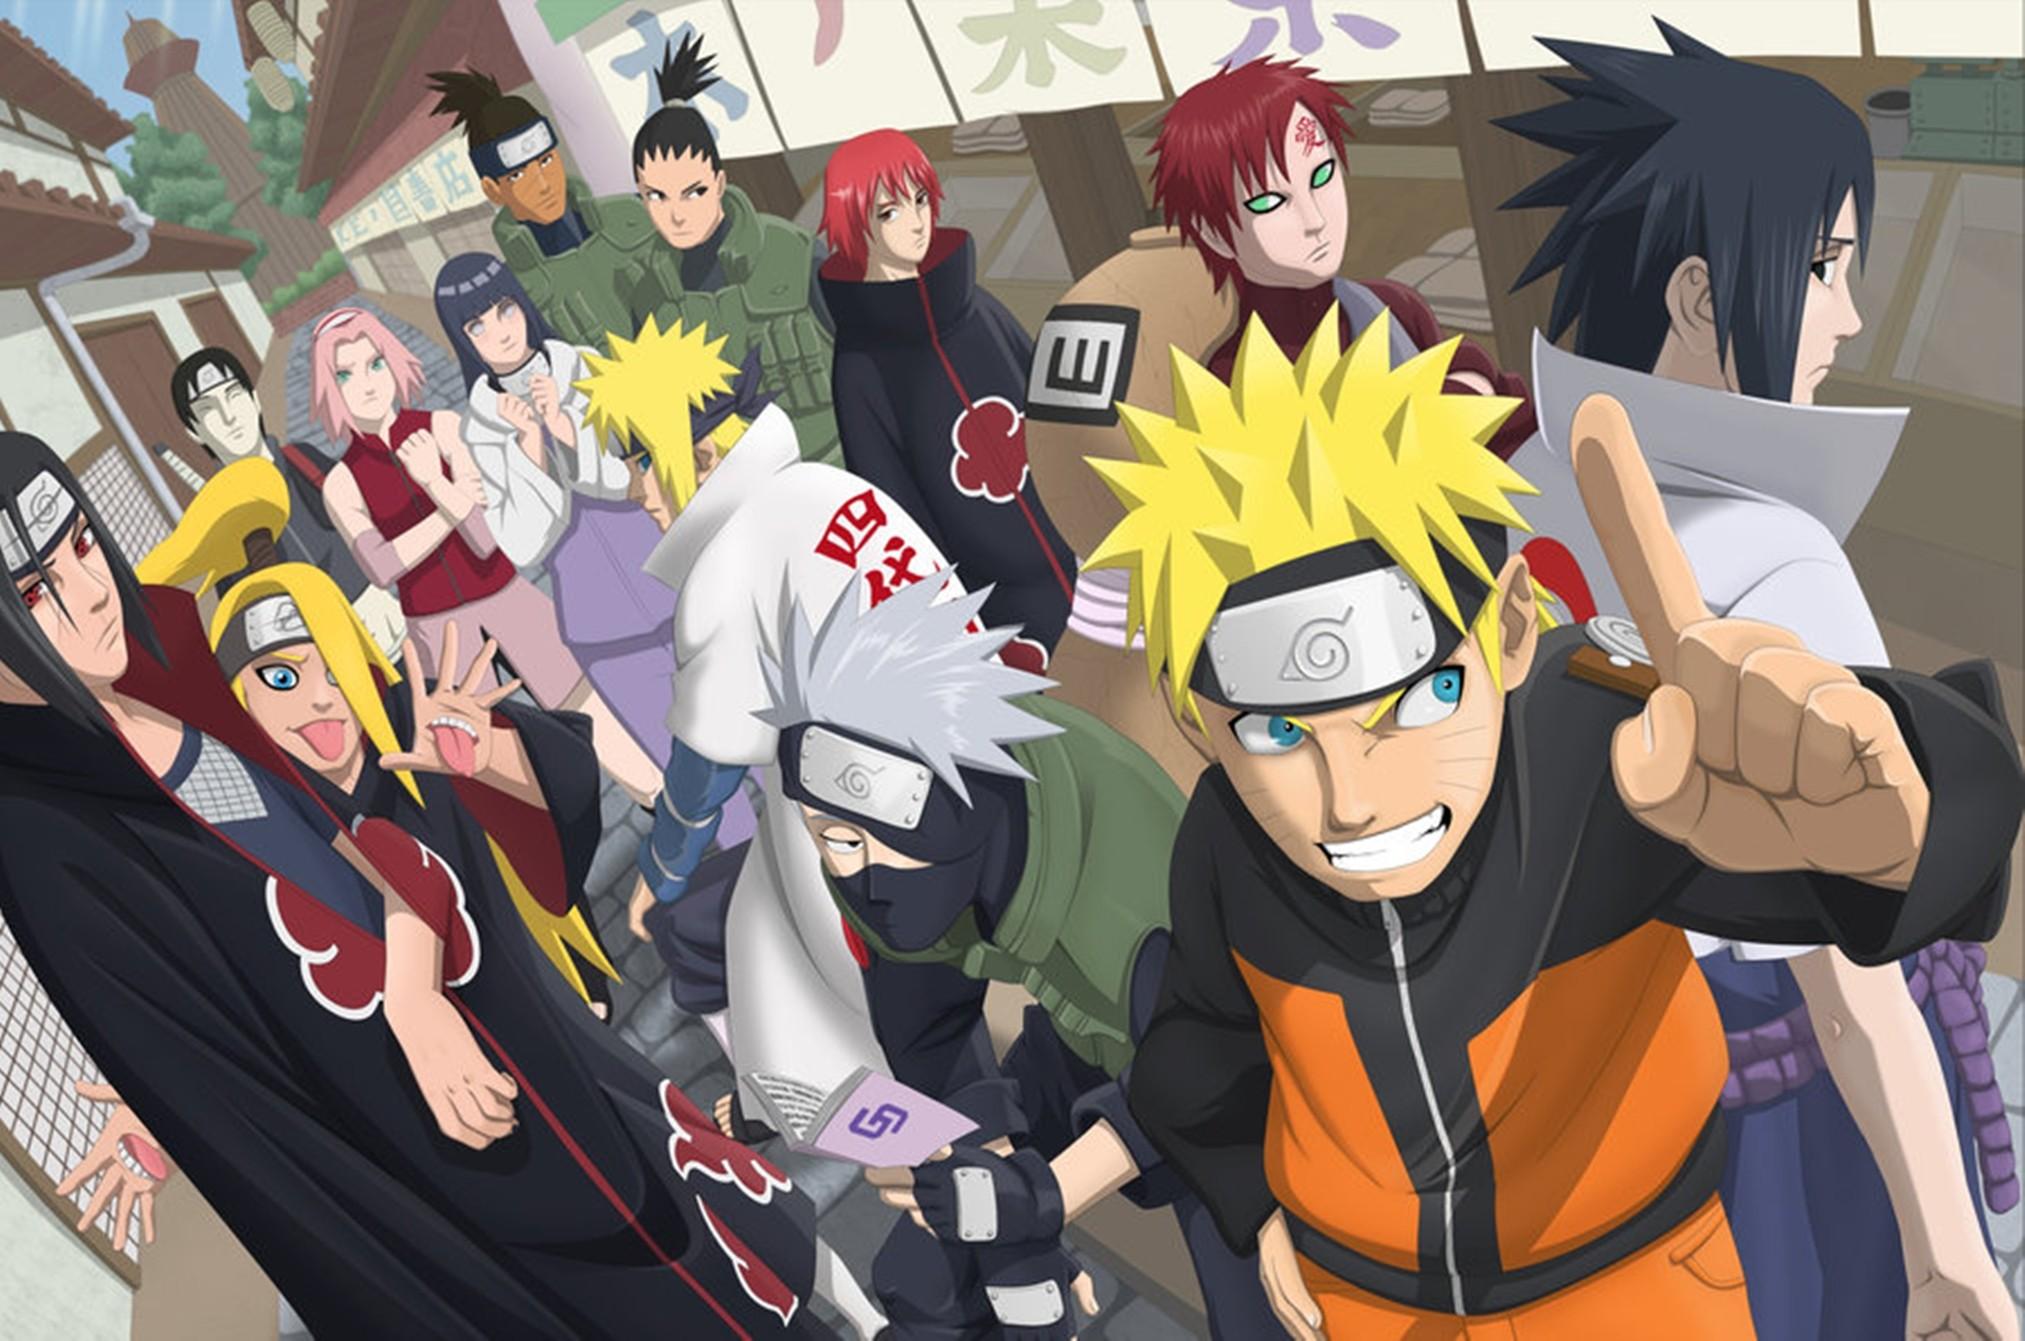 Naruto Shippuden Fond d'écran HD | Arrière-Plan | 2025x1341 | ID:487189 - Wallpaper Abyss